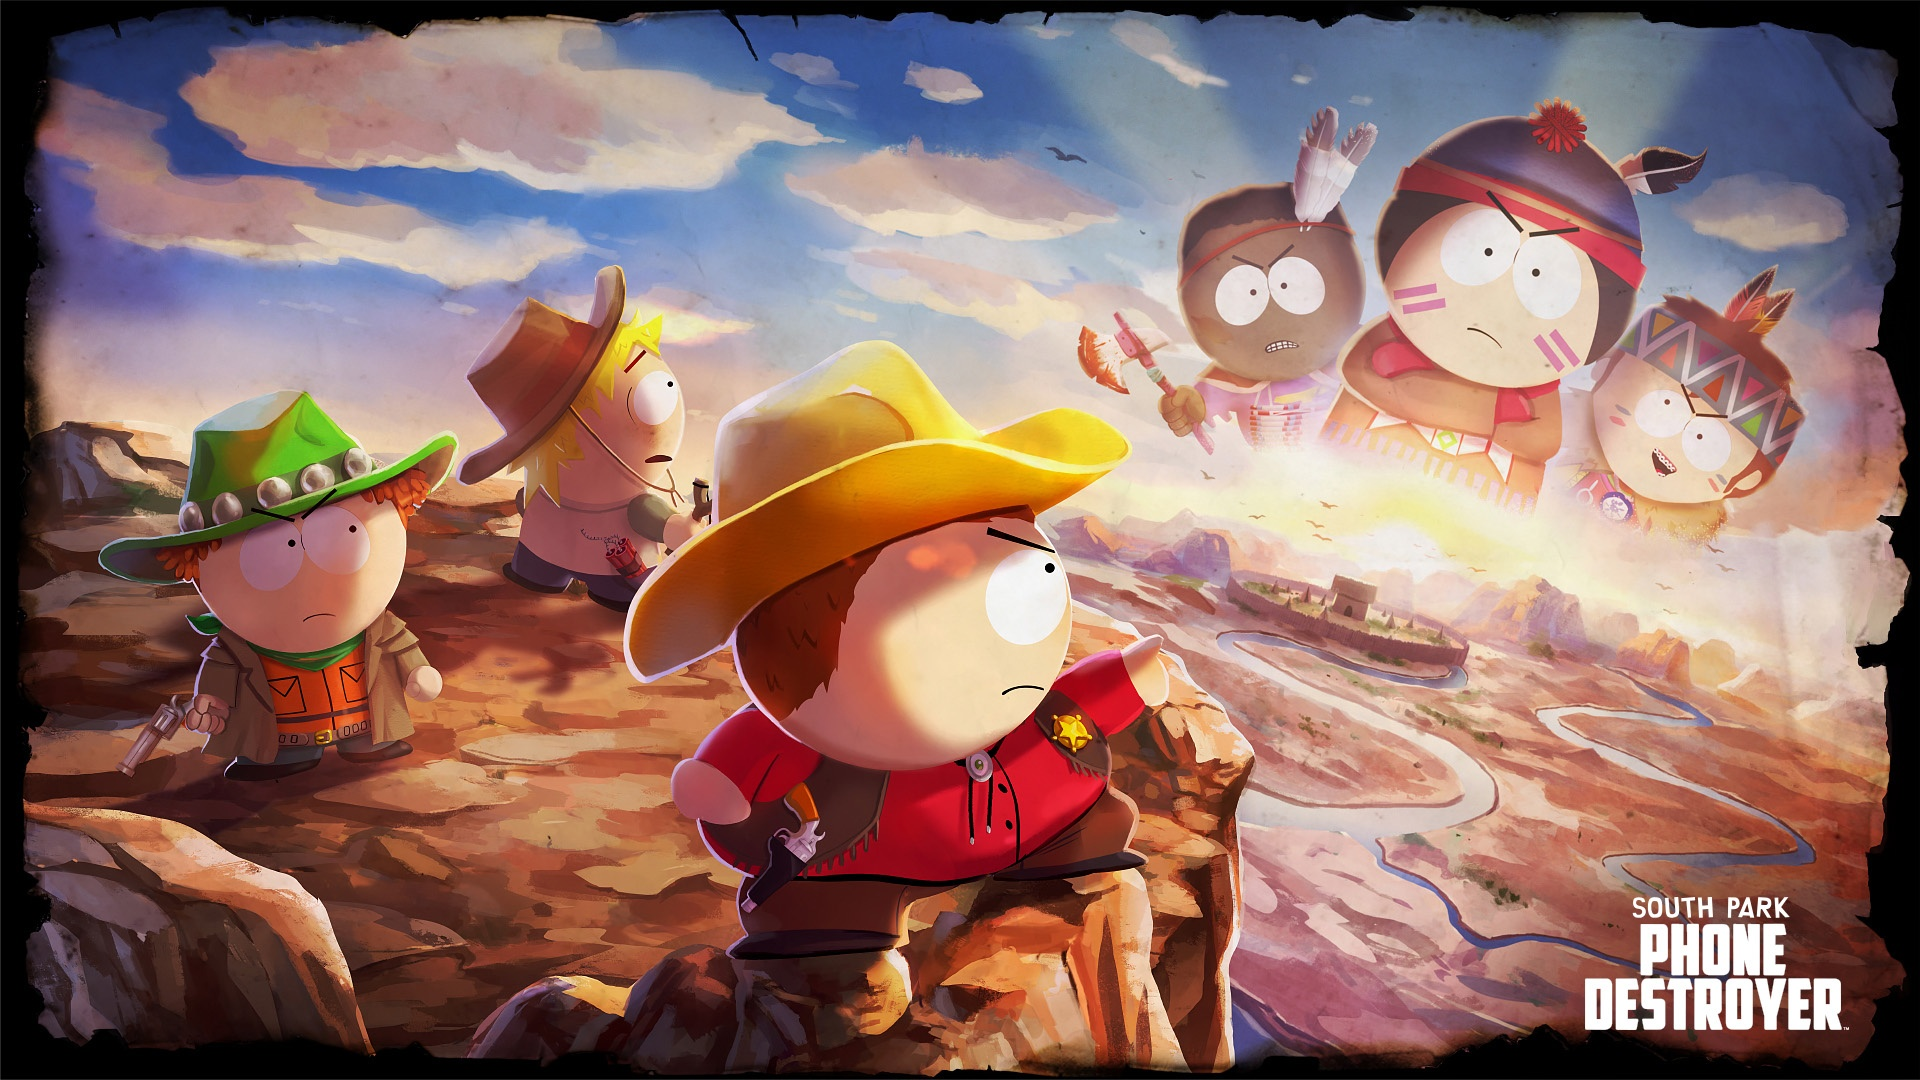 Вышла мобильная South Park: Phone Destroyer. Опубликован релизный трейлер